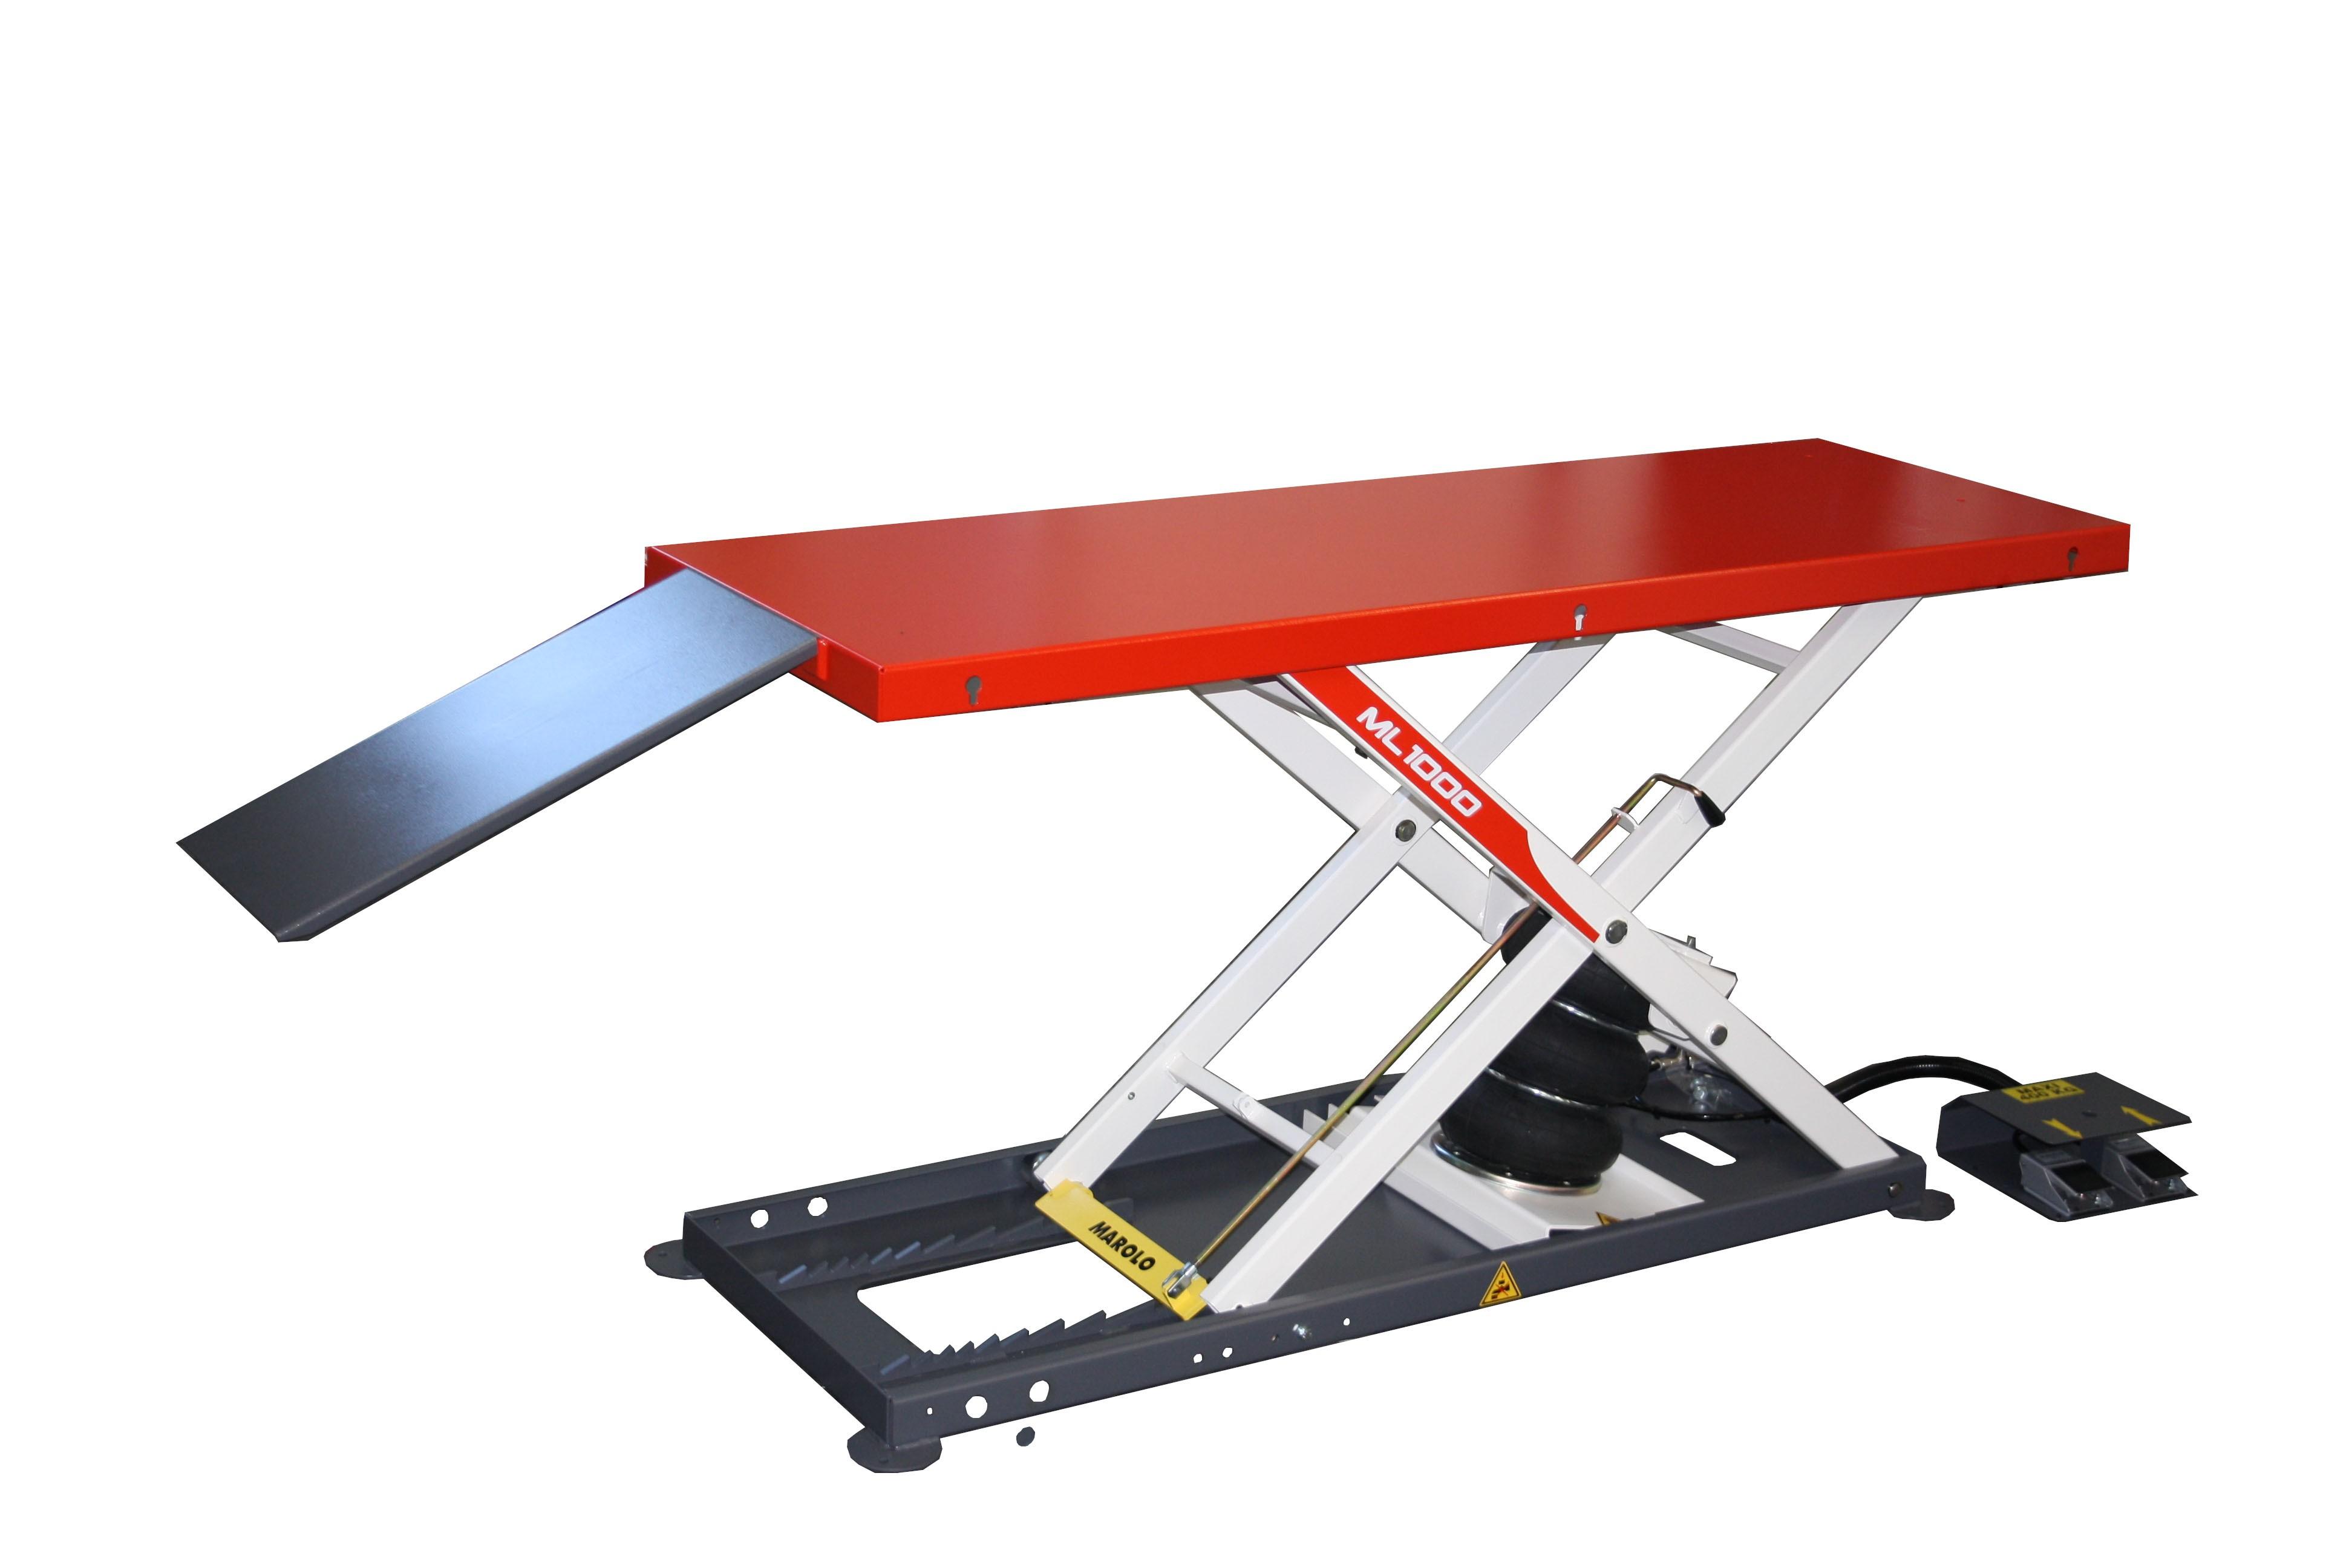 marolotest lift marololift 1000 pcl pneumatic. Black Bedroom Furniture Sets. Home Design Ideas